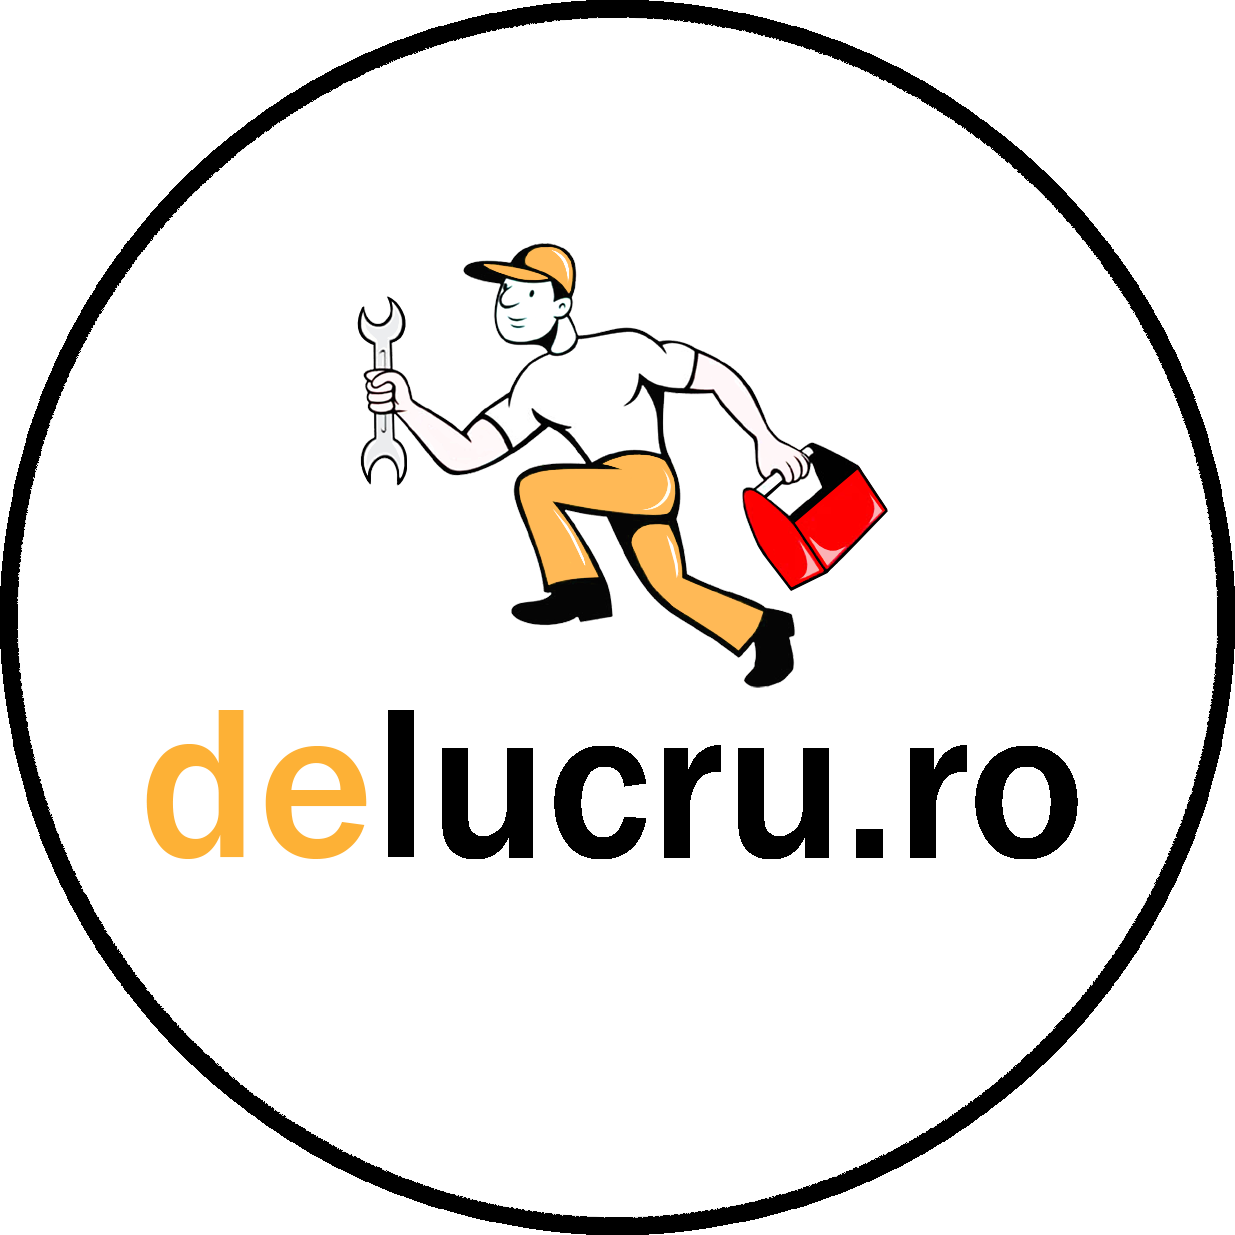 Find a job - logo